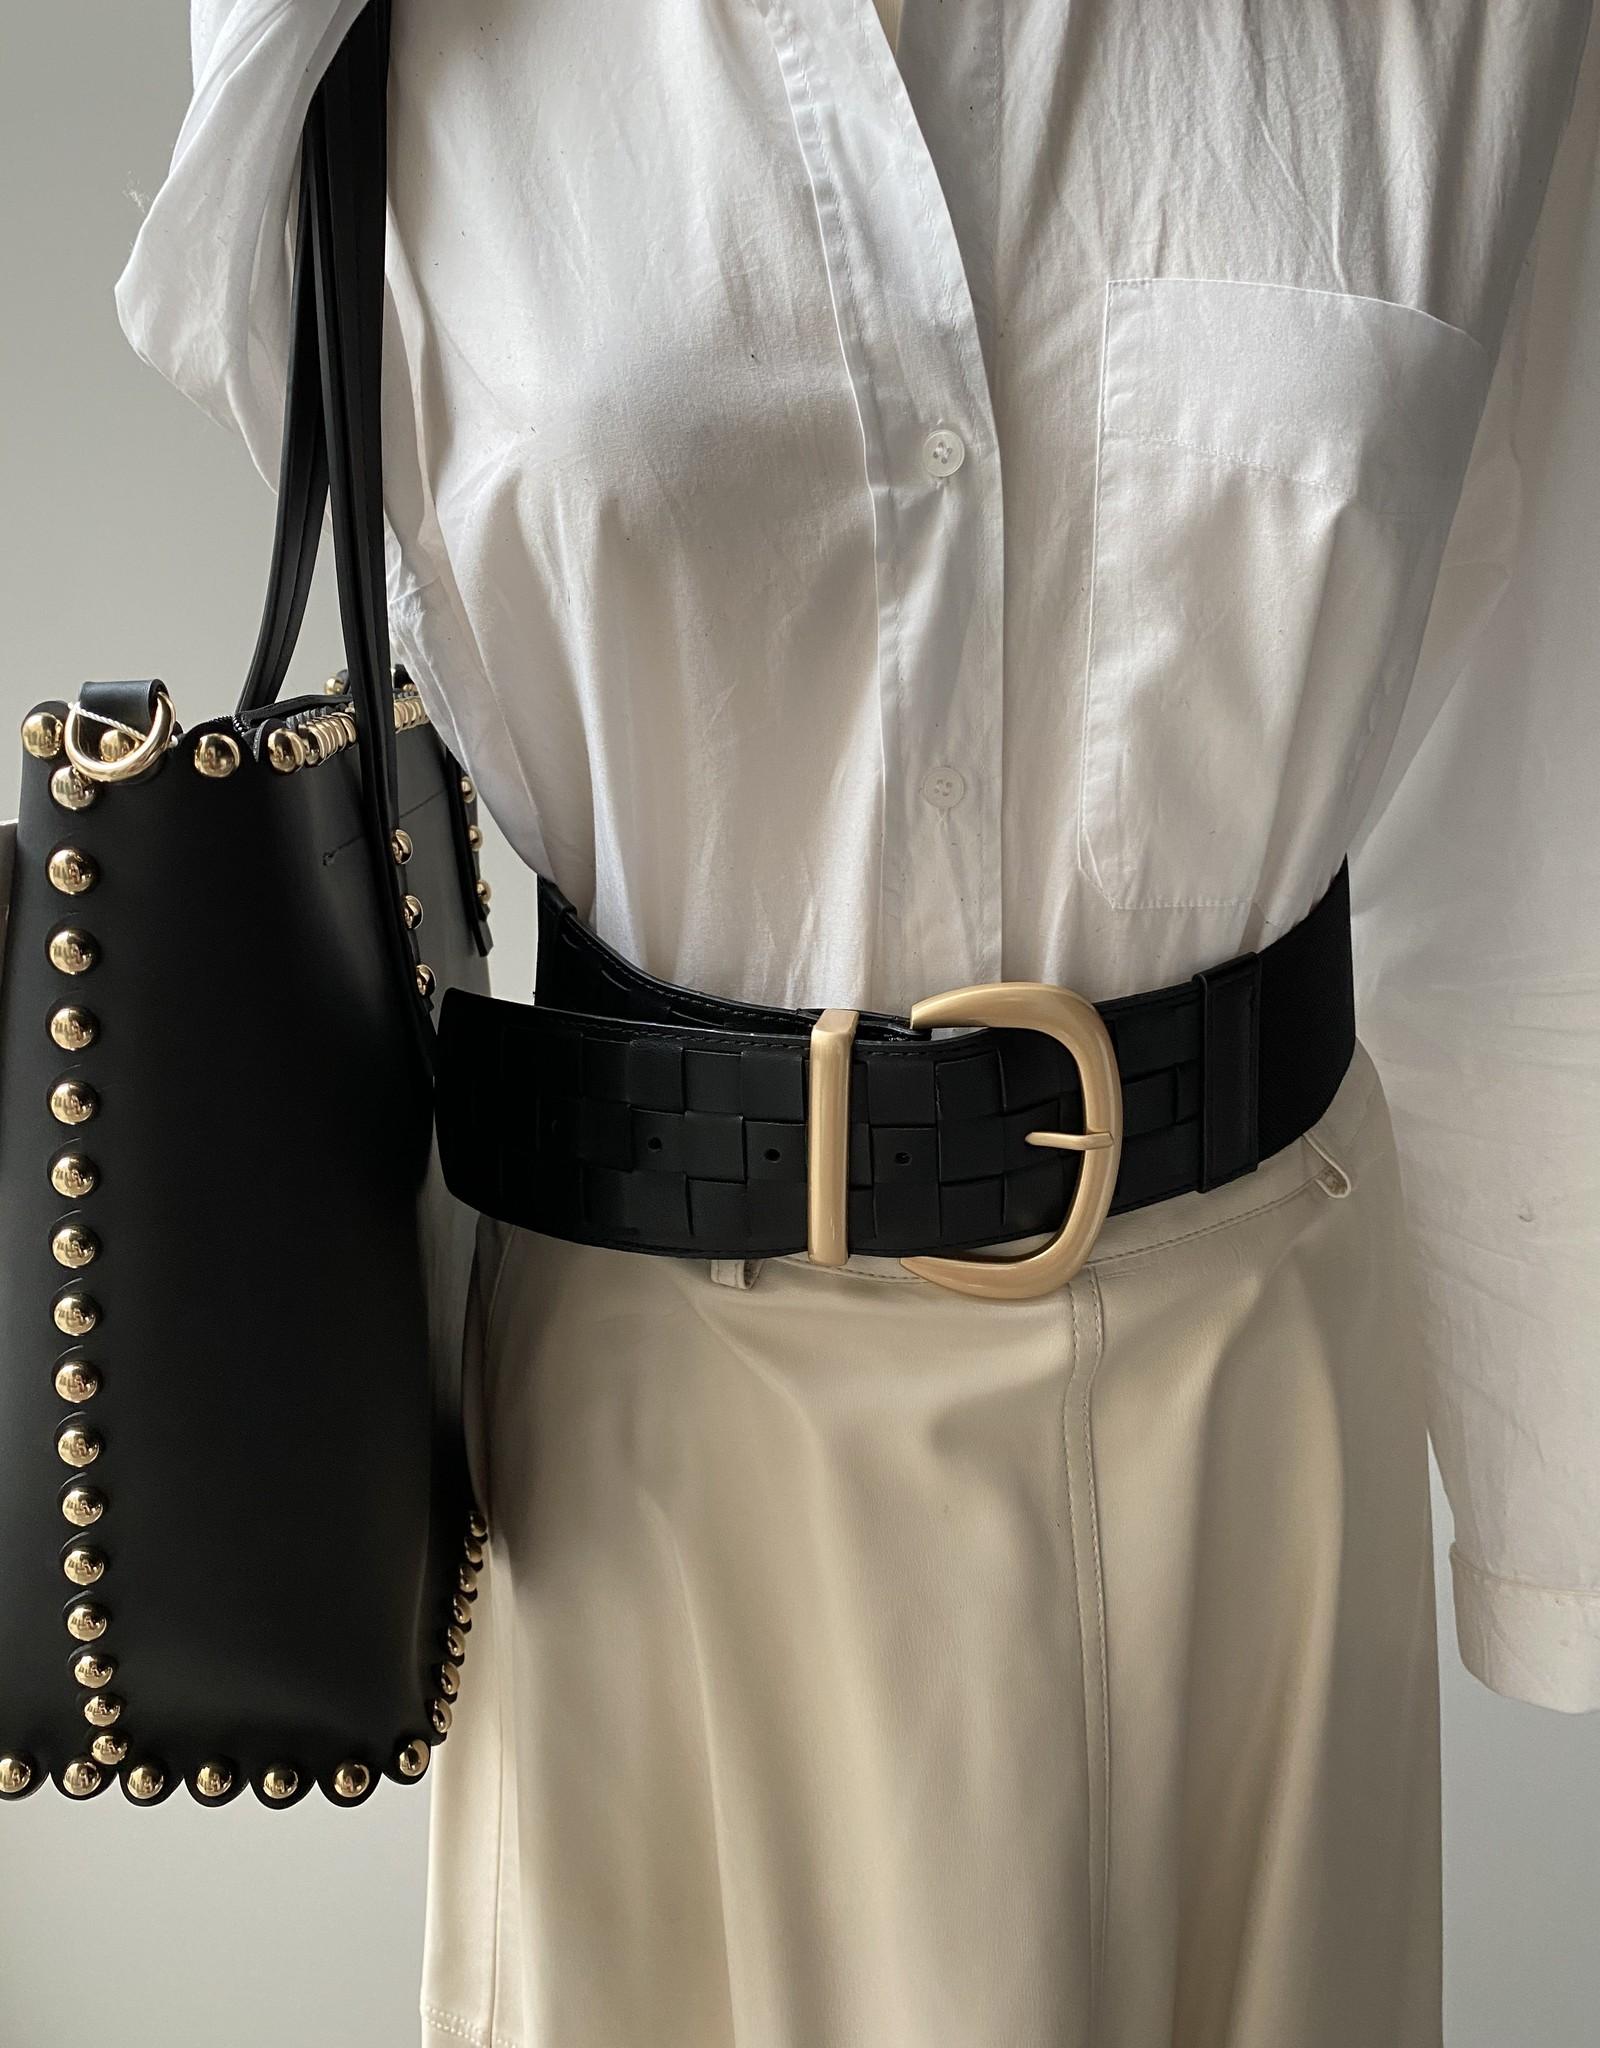 Brede zwarte riem met kunstleder en elastiek, goudkleurige gesp